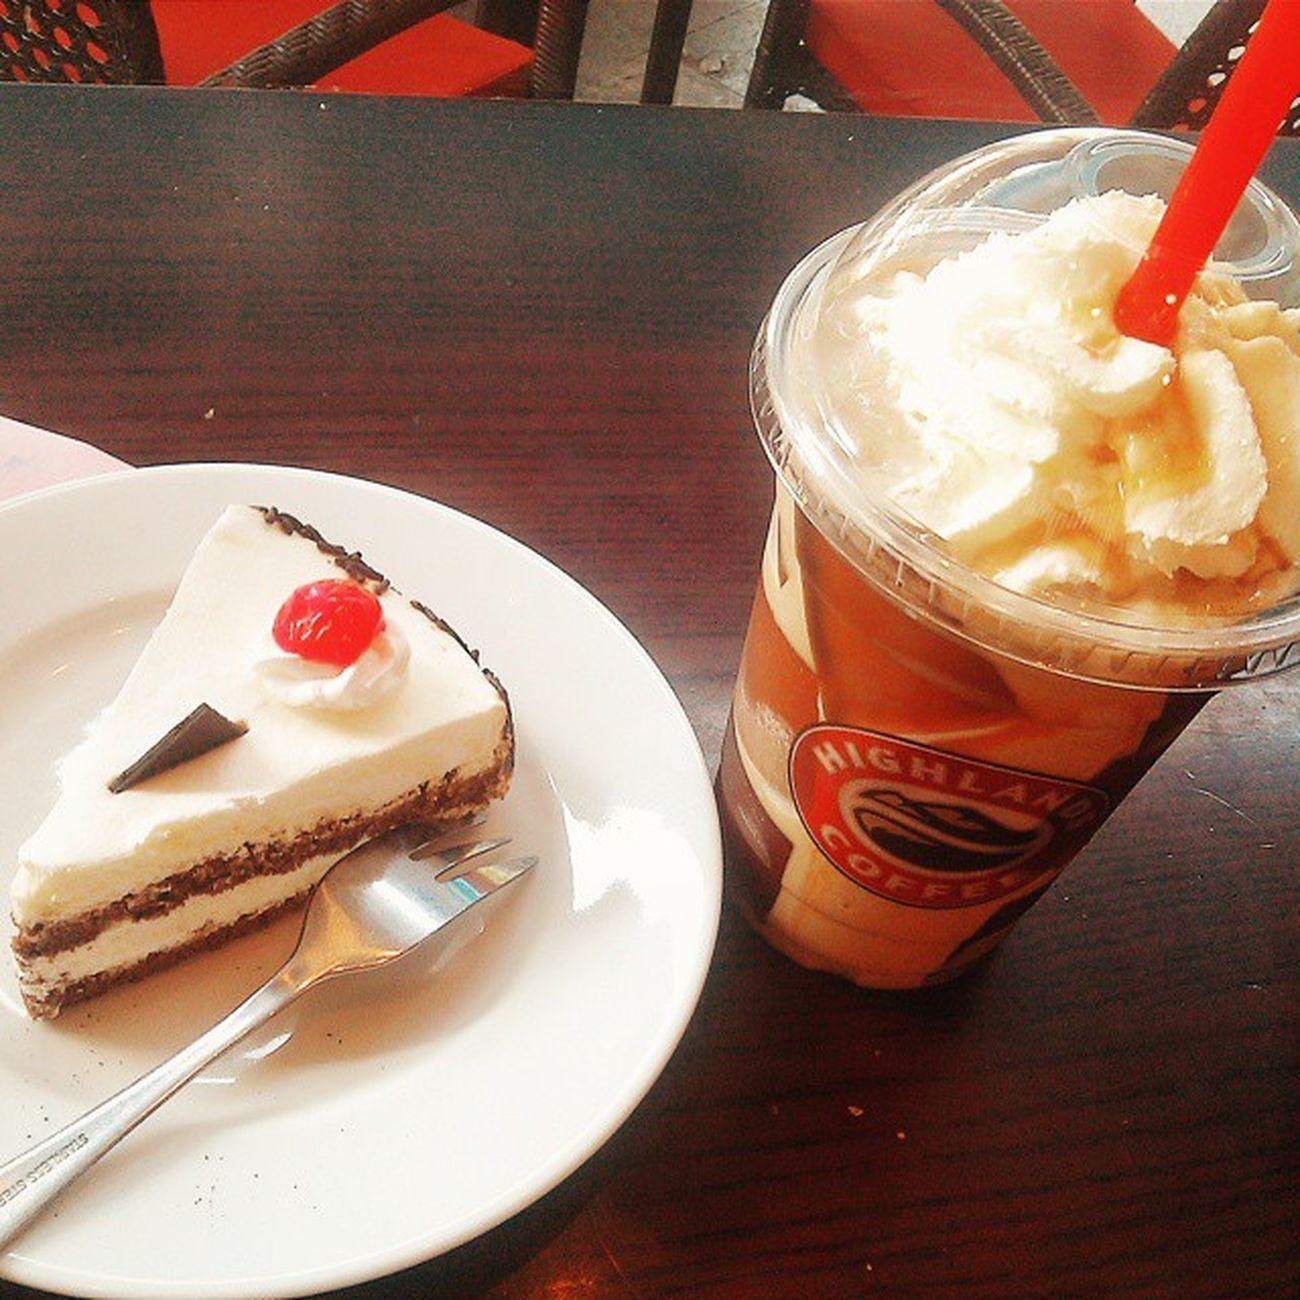 Vscocam Love Highlandscoffee 😍😍😍😍 Caramel Delicious Loveit Coffeetime Loveit Foodyhanoi Vietnam Great Lovely Blackforestcake Niceview Goodday Alonetime 🍹🍹🍰🍰